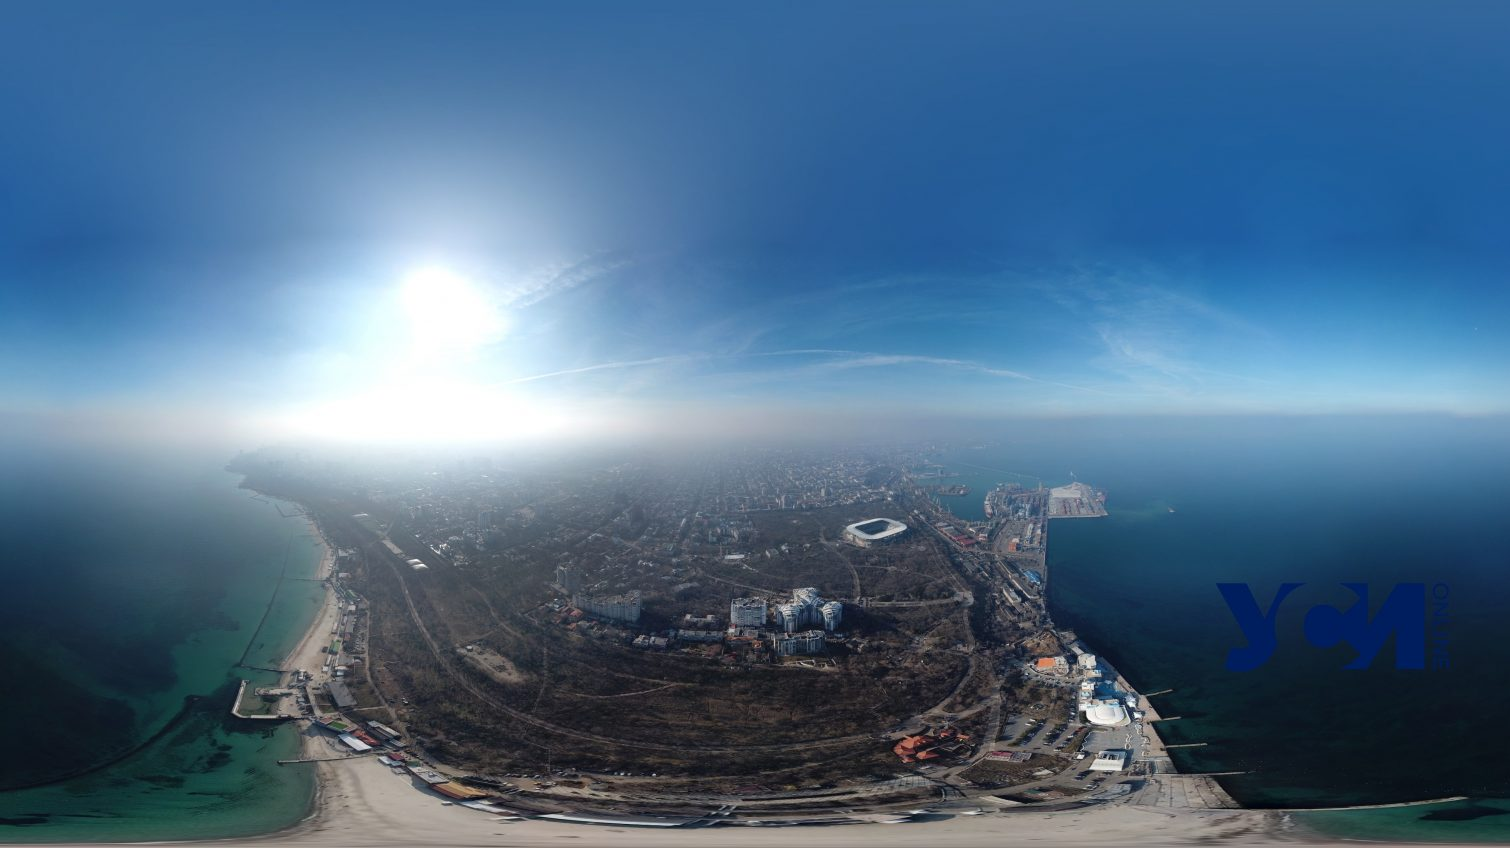 Скоро весна: Ланжерон в лучах февральского солнца (аэросъемка) «фото»